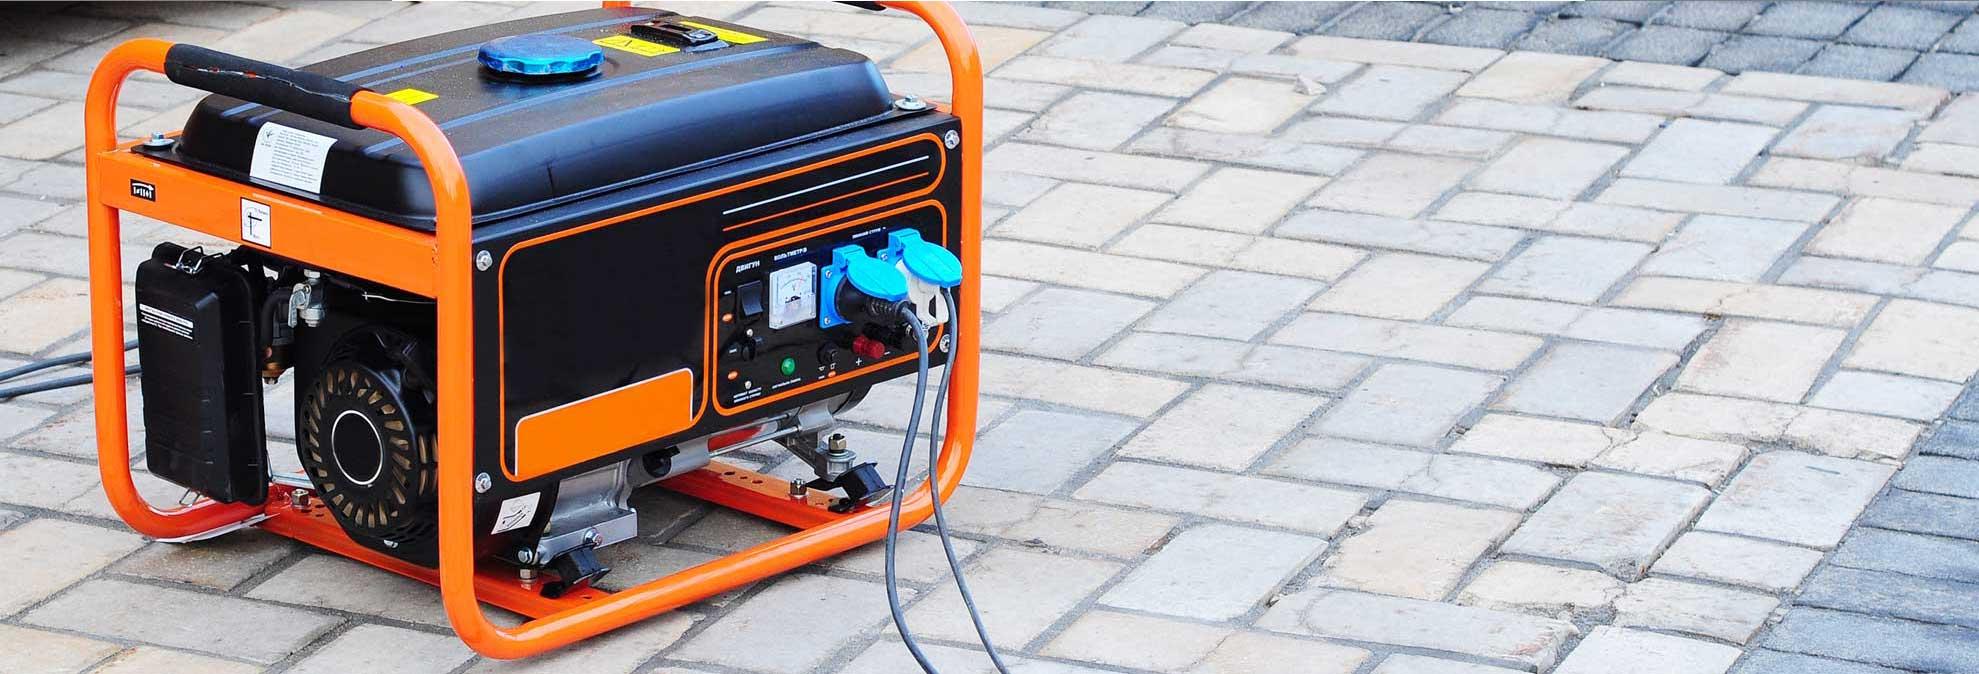 Super generator Petroleum Supply Logistics in Nigeria | Dreg Waters Petroleum and Logisitics